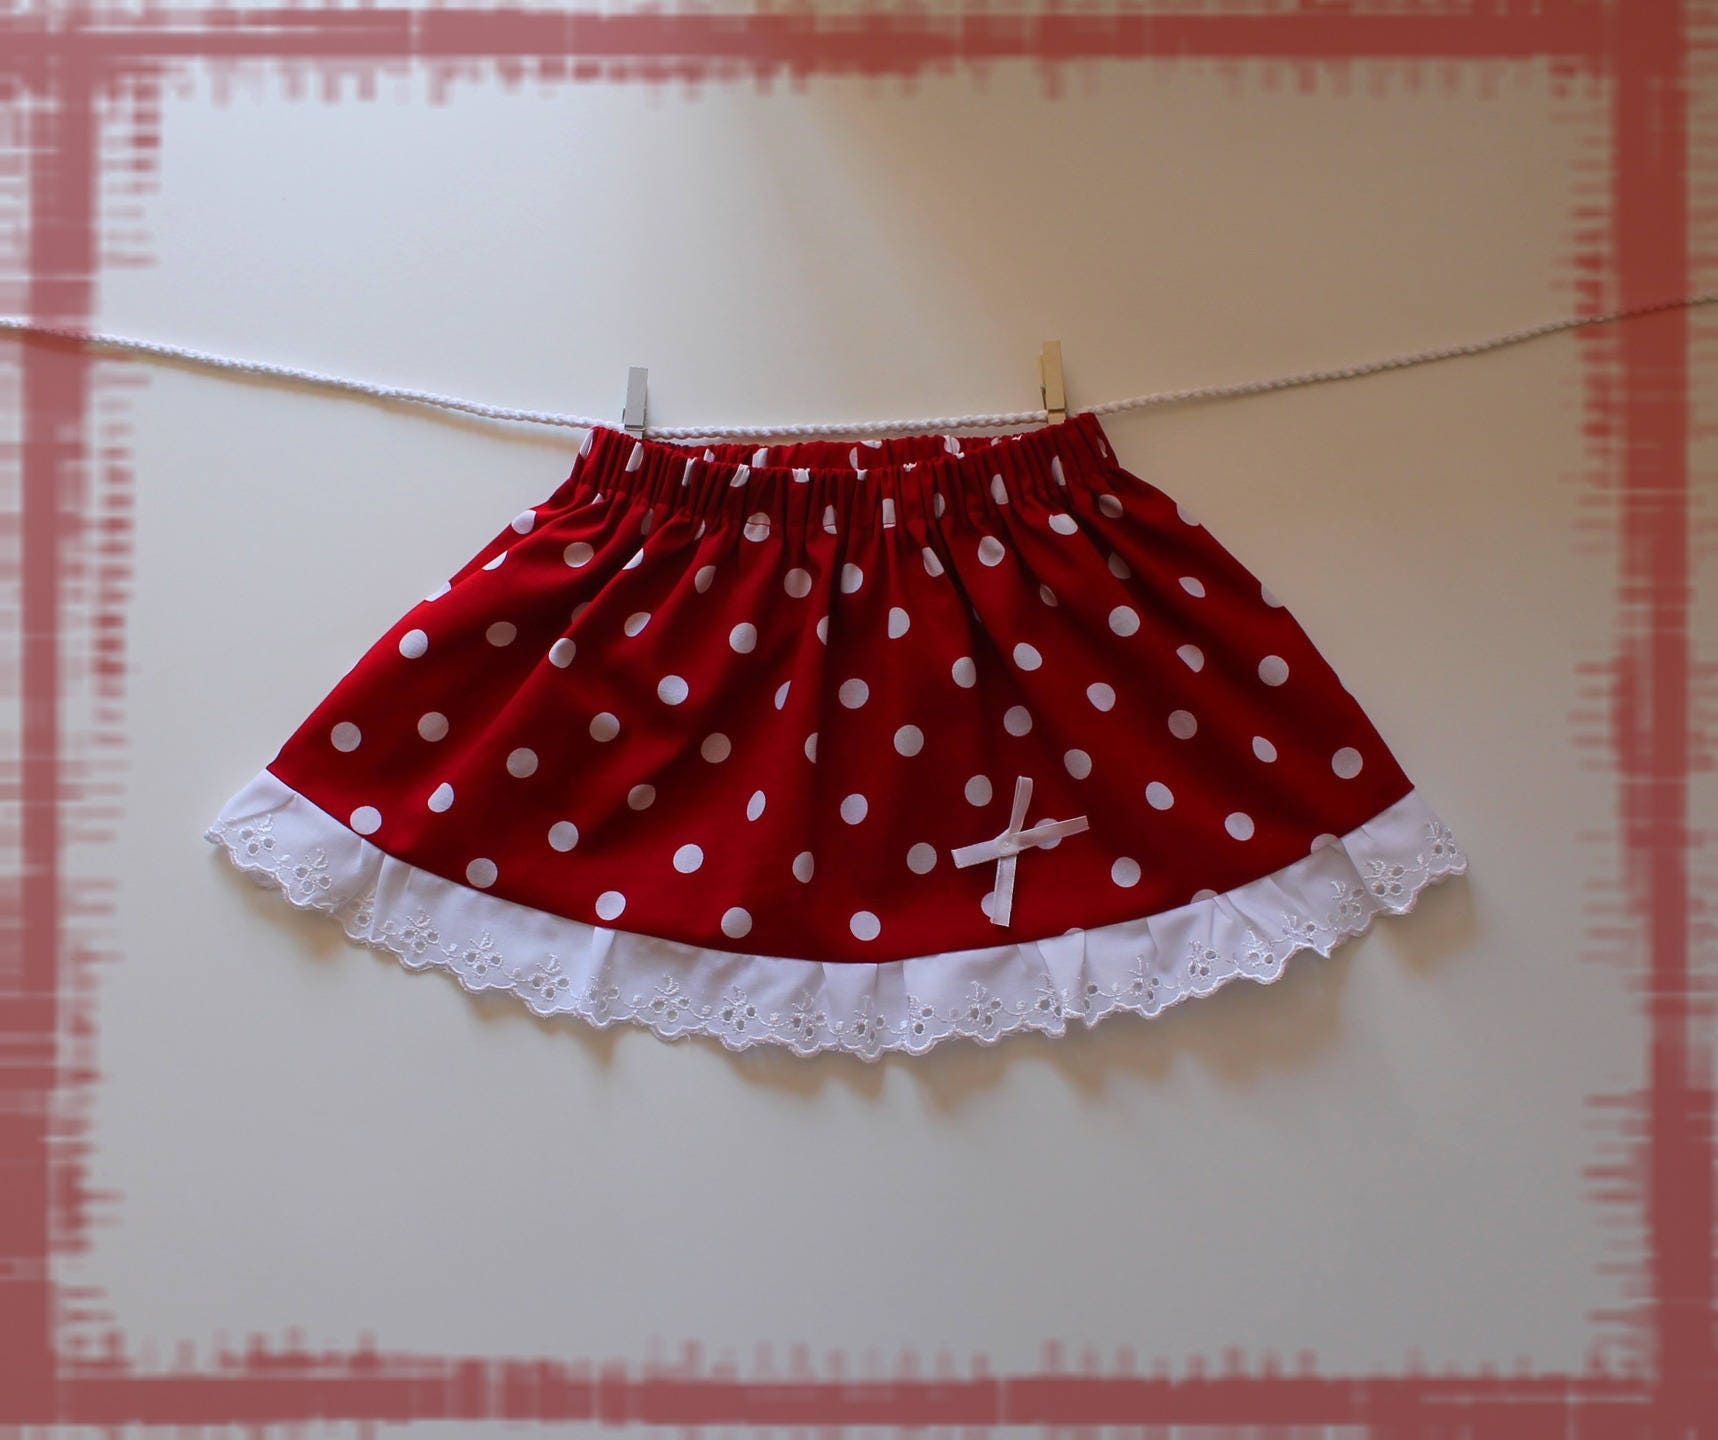 jupe b b fille taille 12 mois rouge pois blancs petit etsy. Black Bedroom Furniture Sets. Home Design Ideas